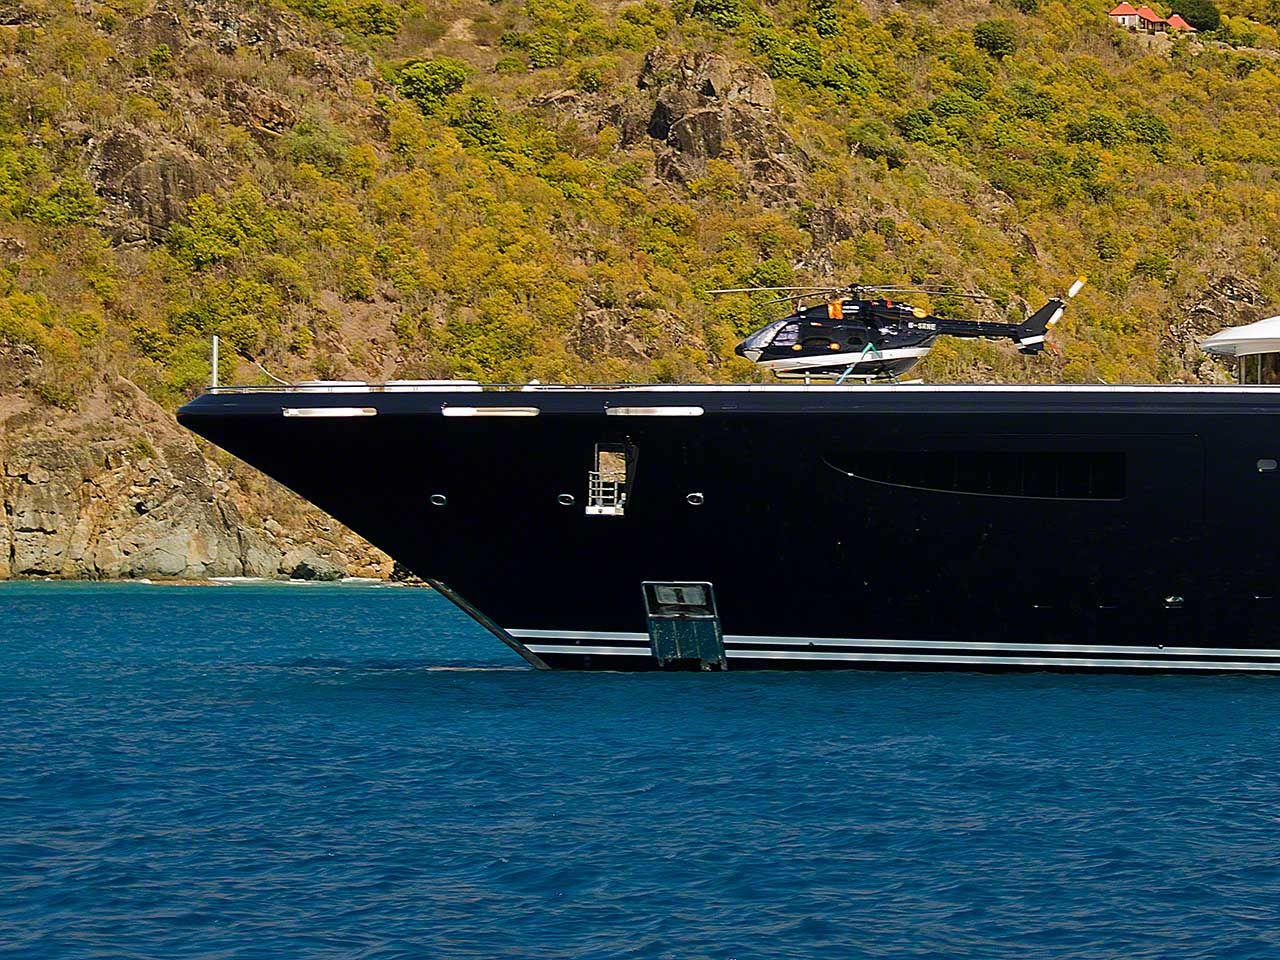 Serene Yacht Helicopter On Serene Serene Boat Helicopter